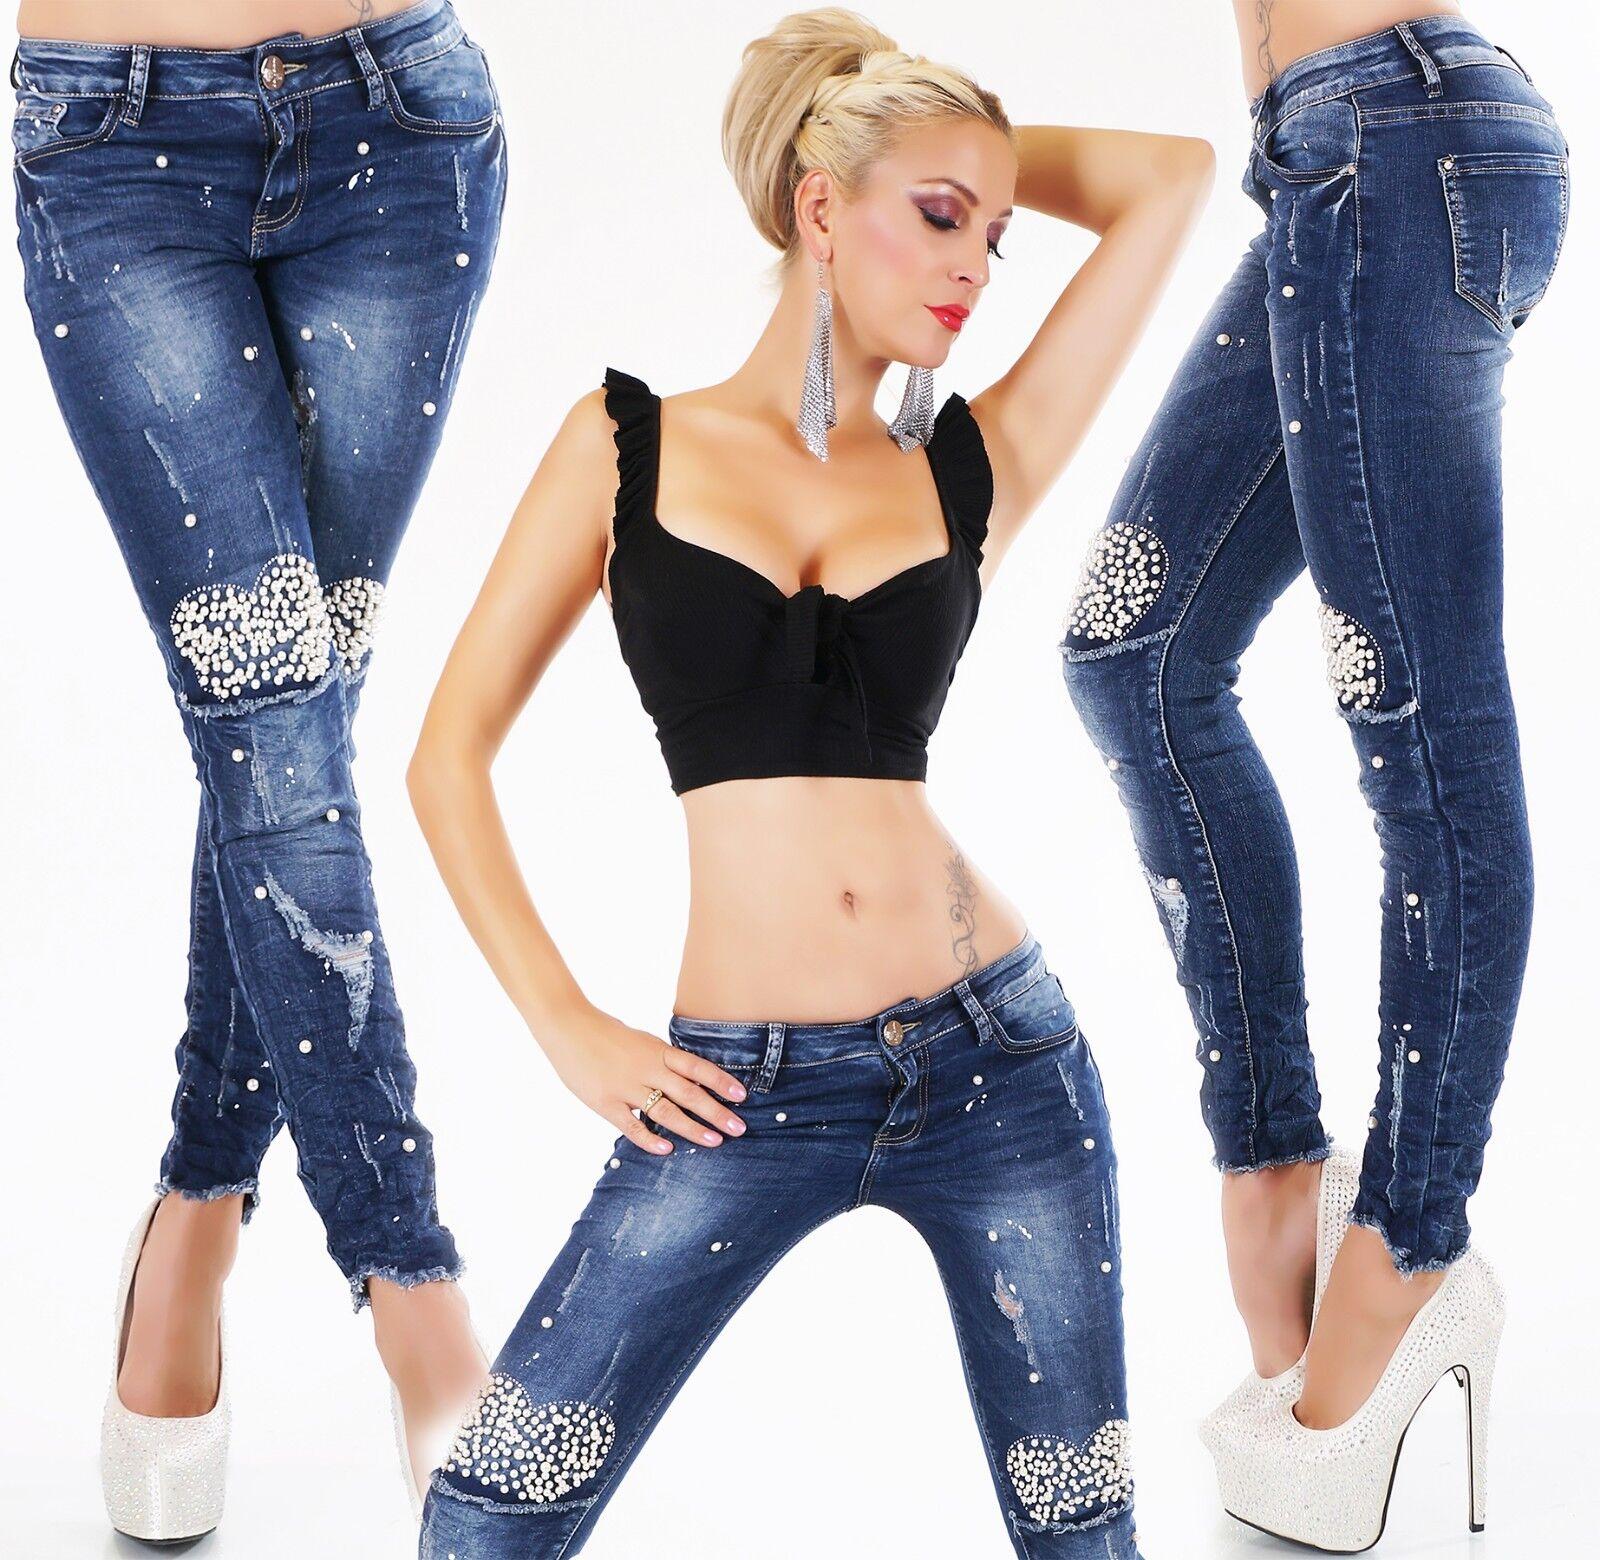 Original Designer Stretch Jeans damen Trousers Skinny Jeans Pearls abwetzungen XS-XL